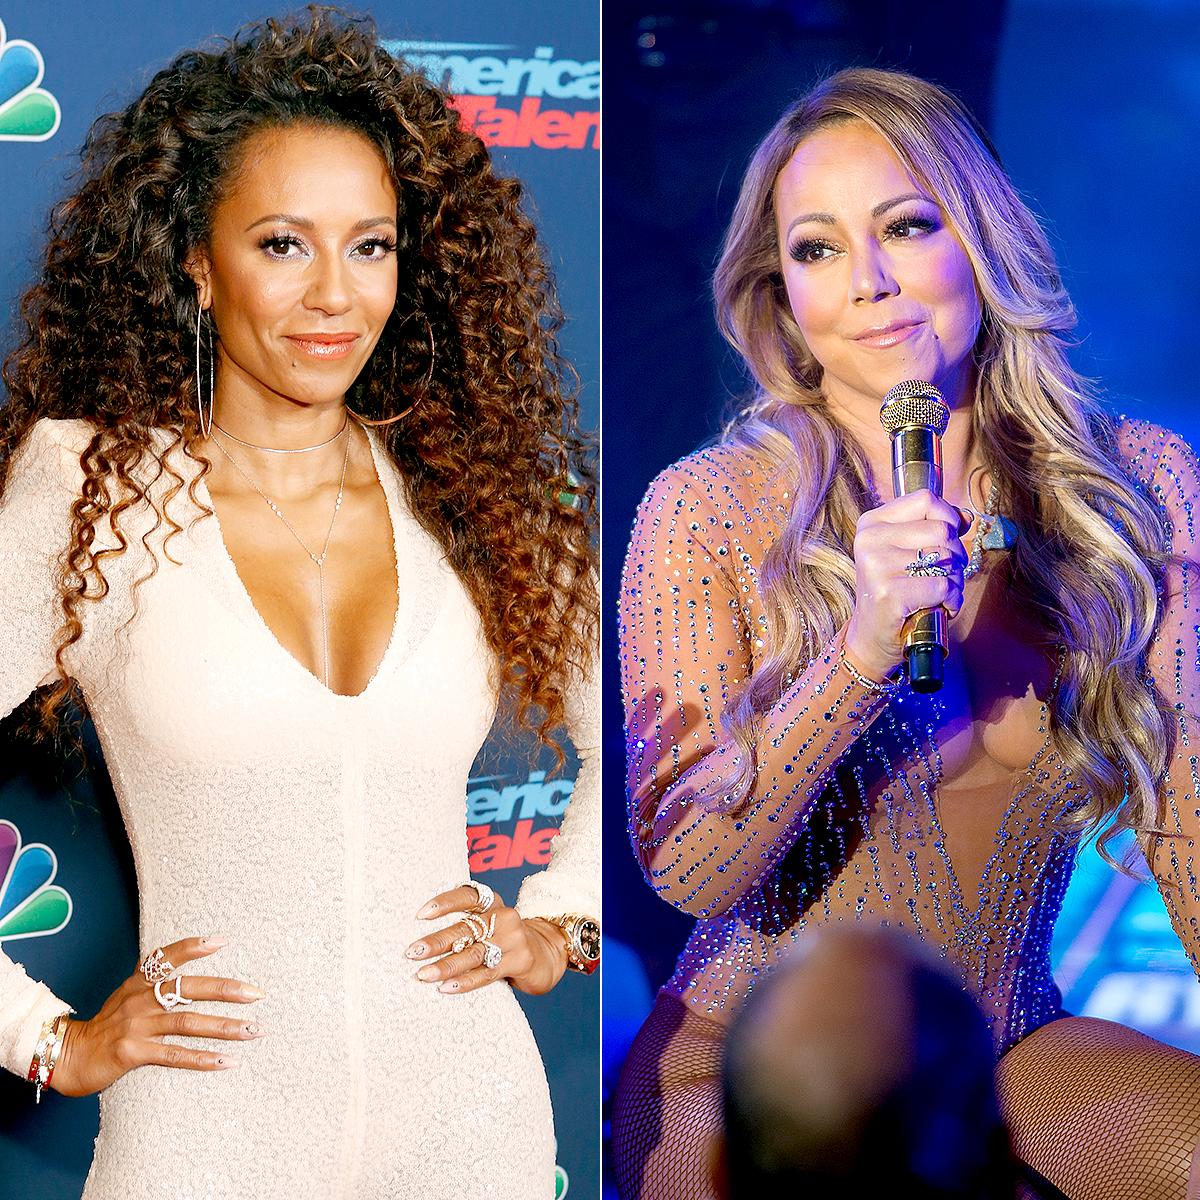 Mel B and Mariah Carey